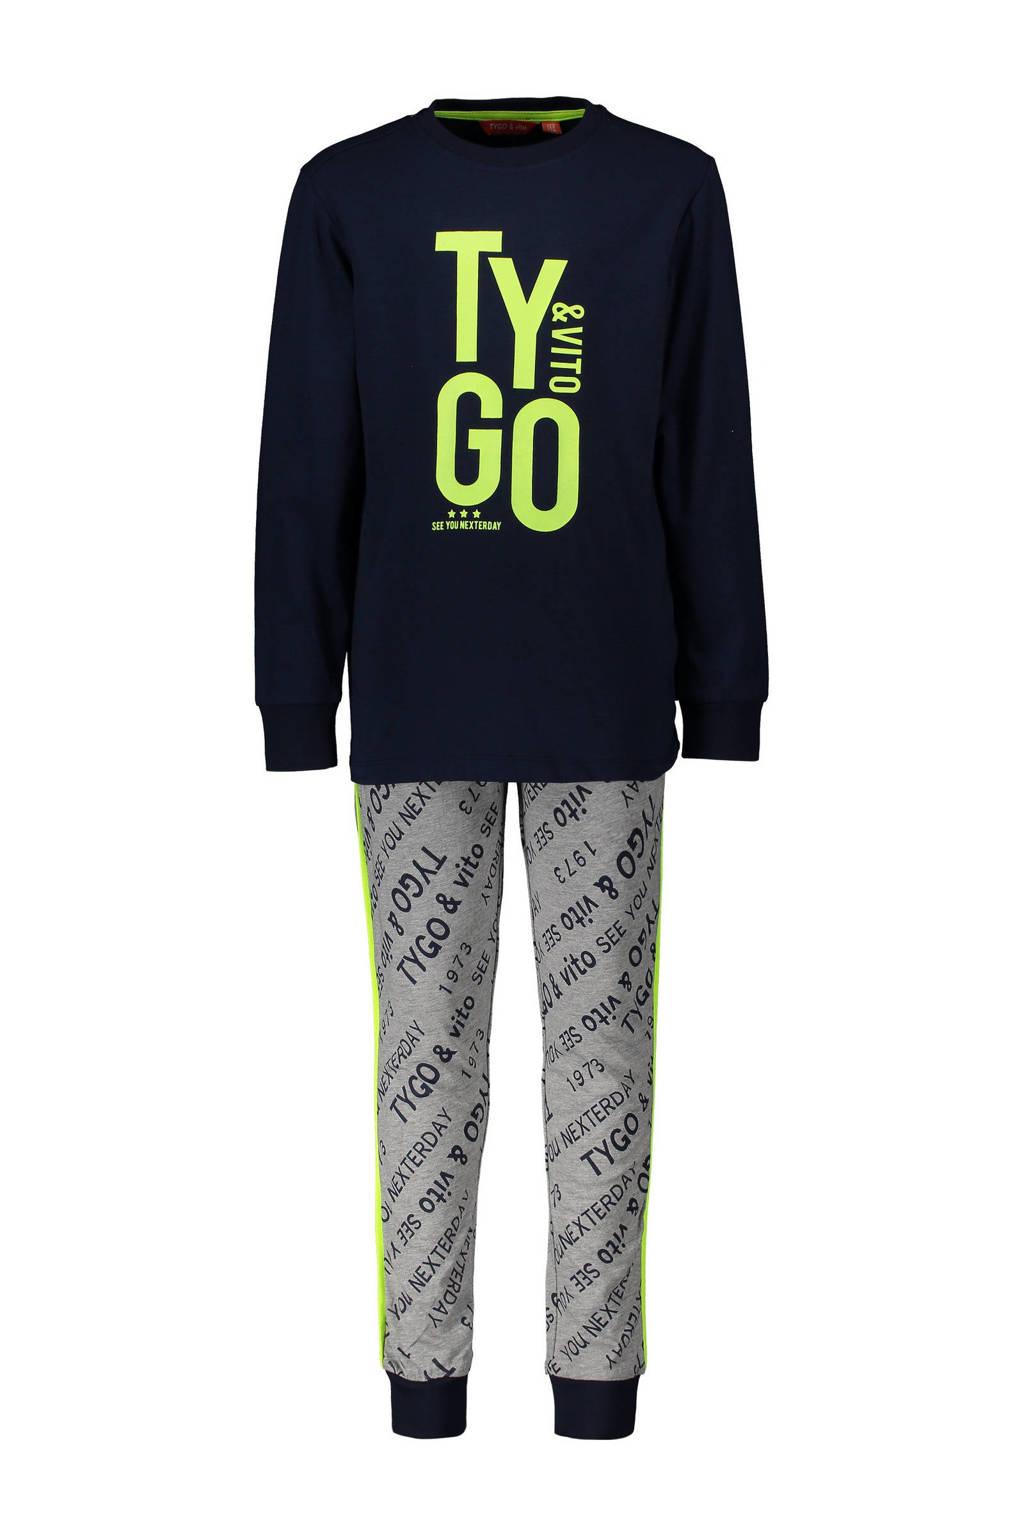 TYGO & vito   pyjama printopdruk donkerblauw/grijs, Donkerblauw/grijs melange/grijs